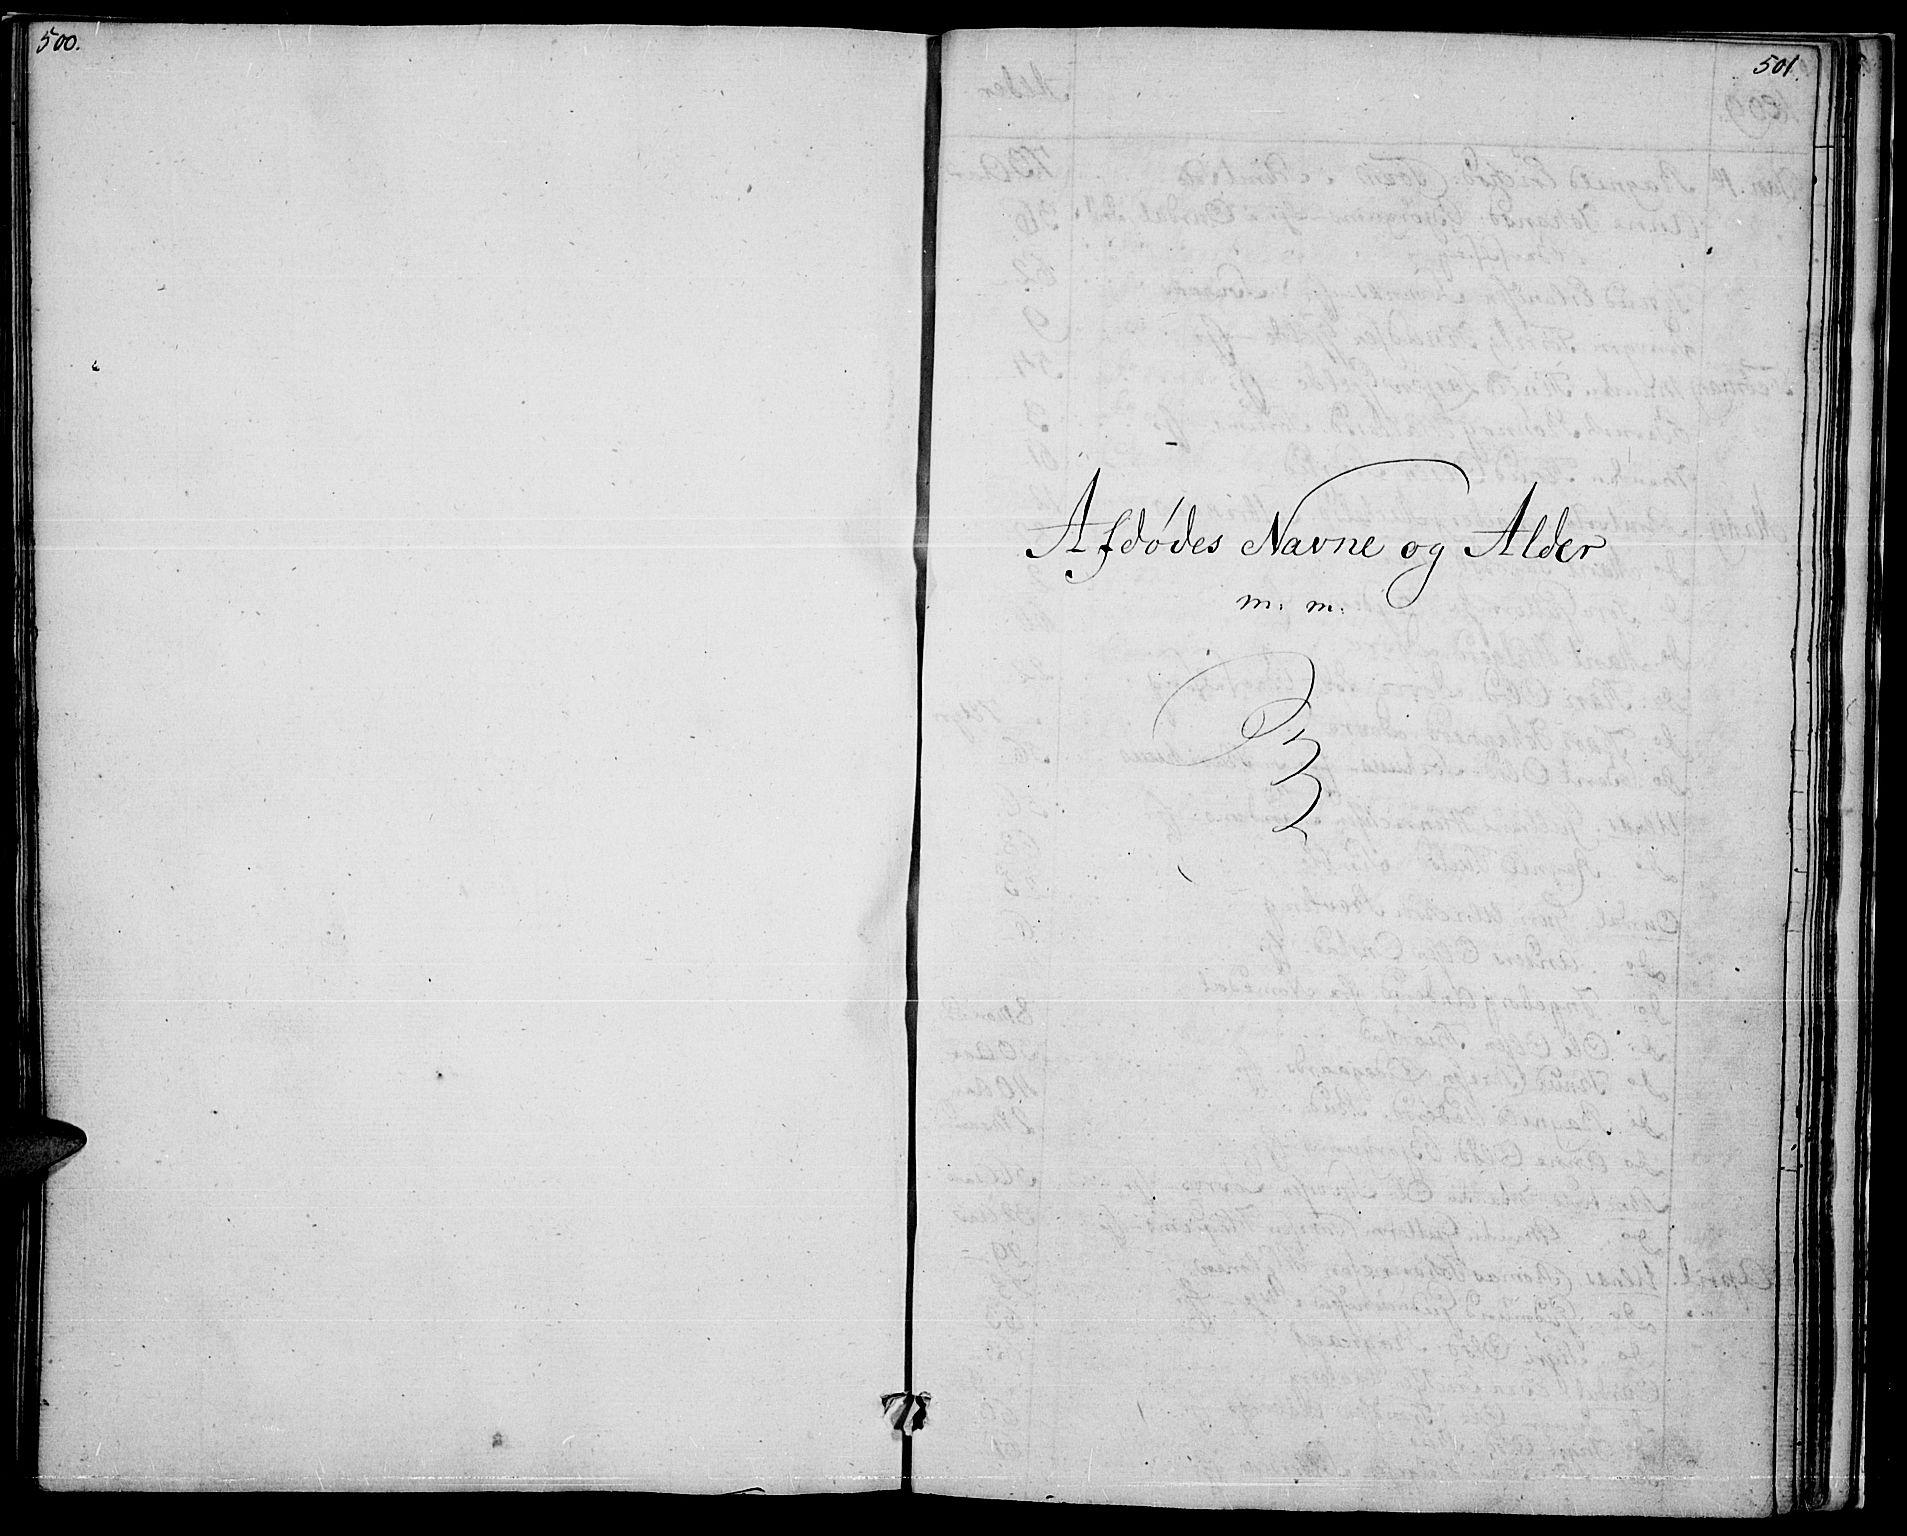 SAH, Nord-Aurdal prestekontor, Ministerialbok nr. 1, 1808-1815, s. 500-501